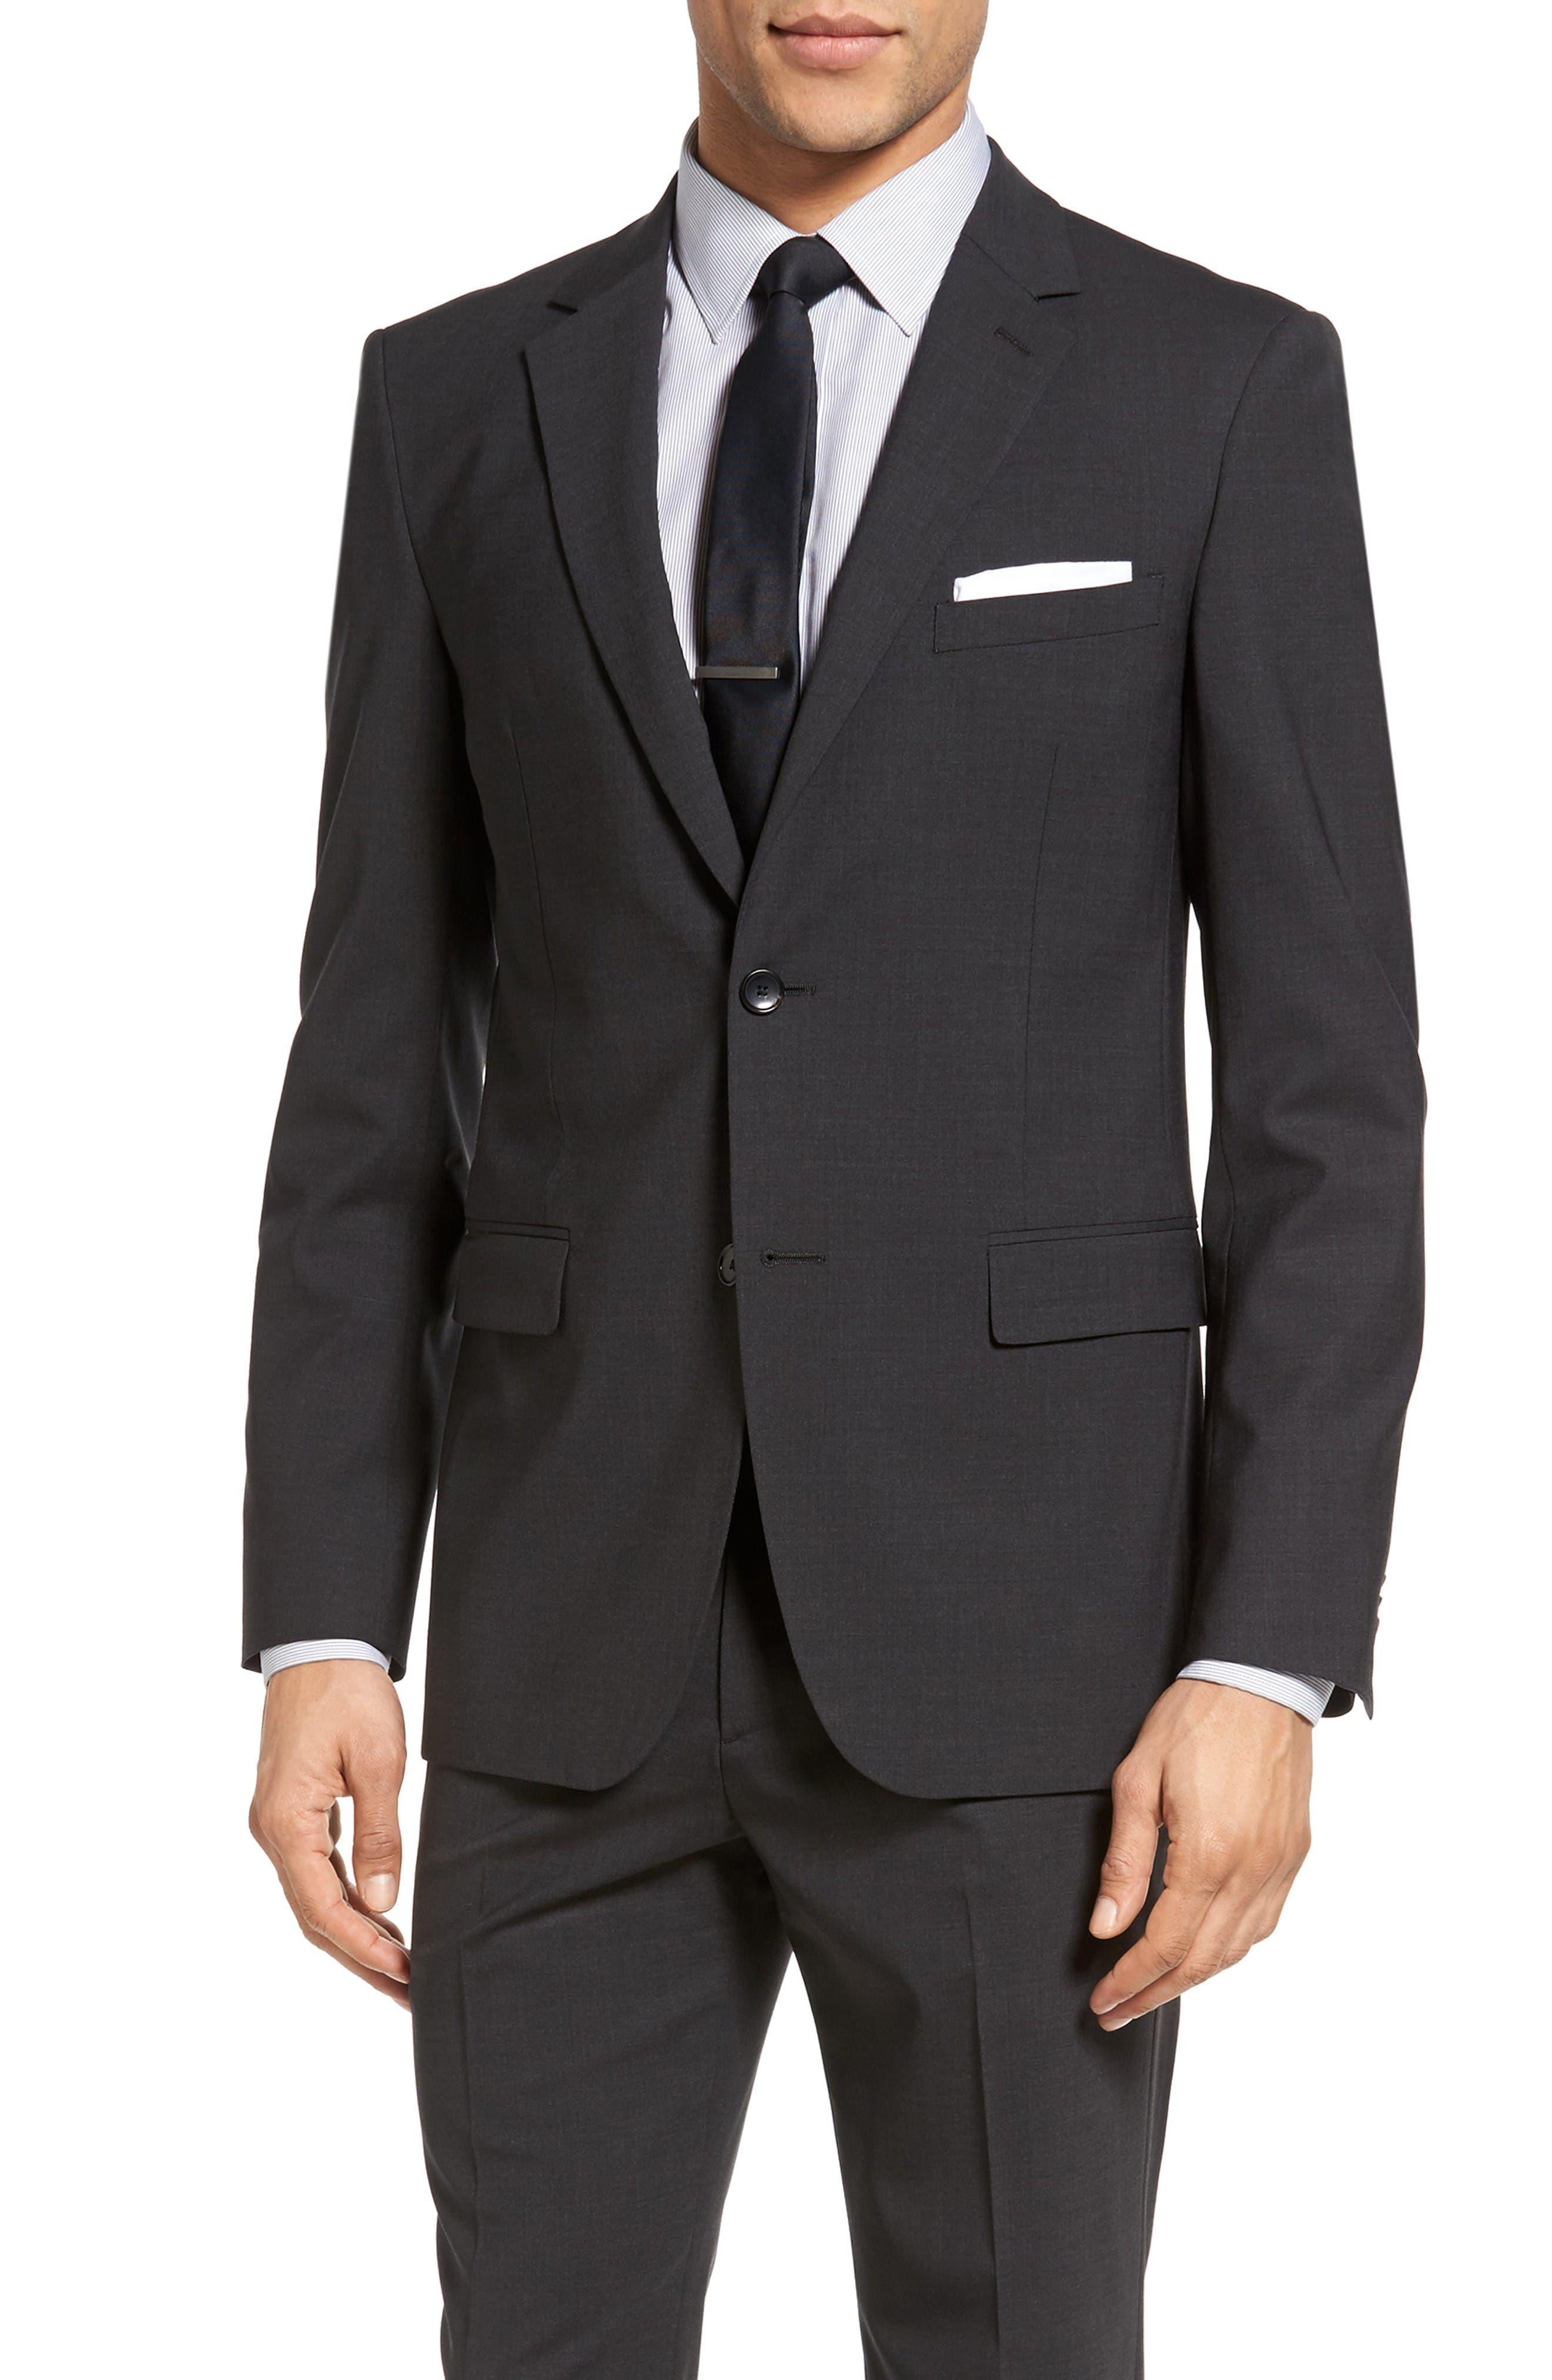 Wellar New Tailor 1 Trim Fit Stretch Wool Sport Coat,                             Main thumbnail 1, color,                             Dark Charcoal